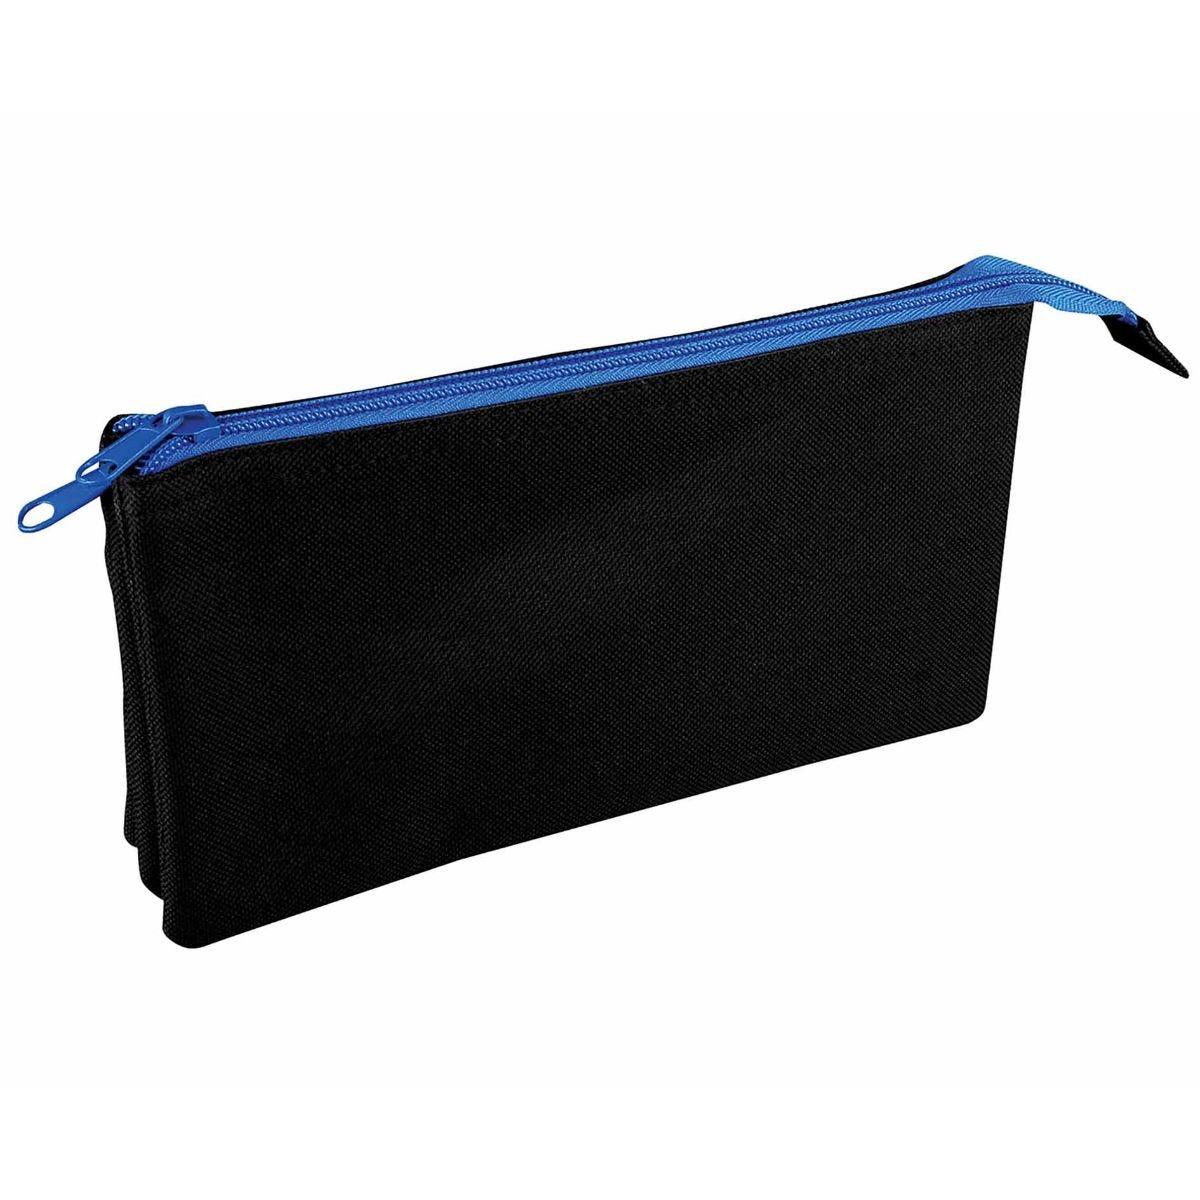 Image of Flat Triple Pocket Pencil Case Assorted Zip, Black